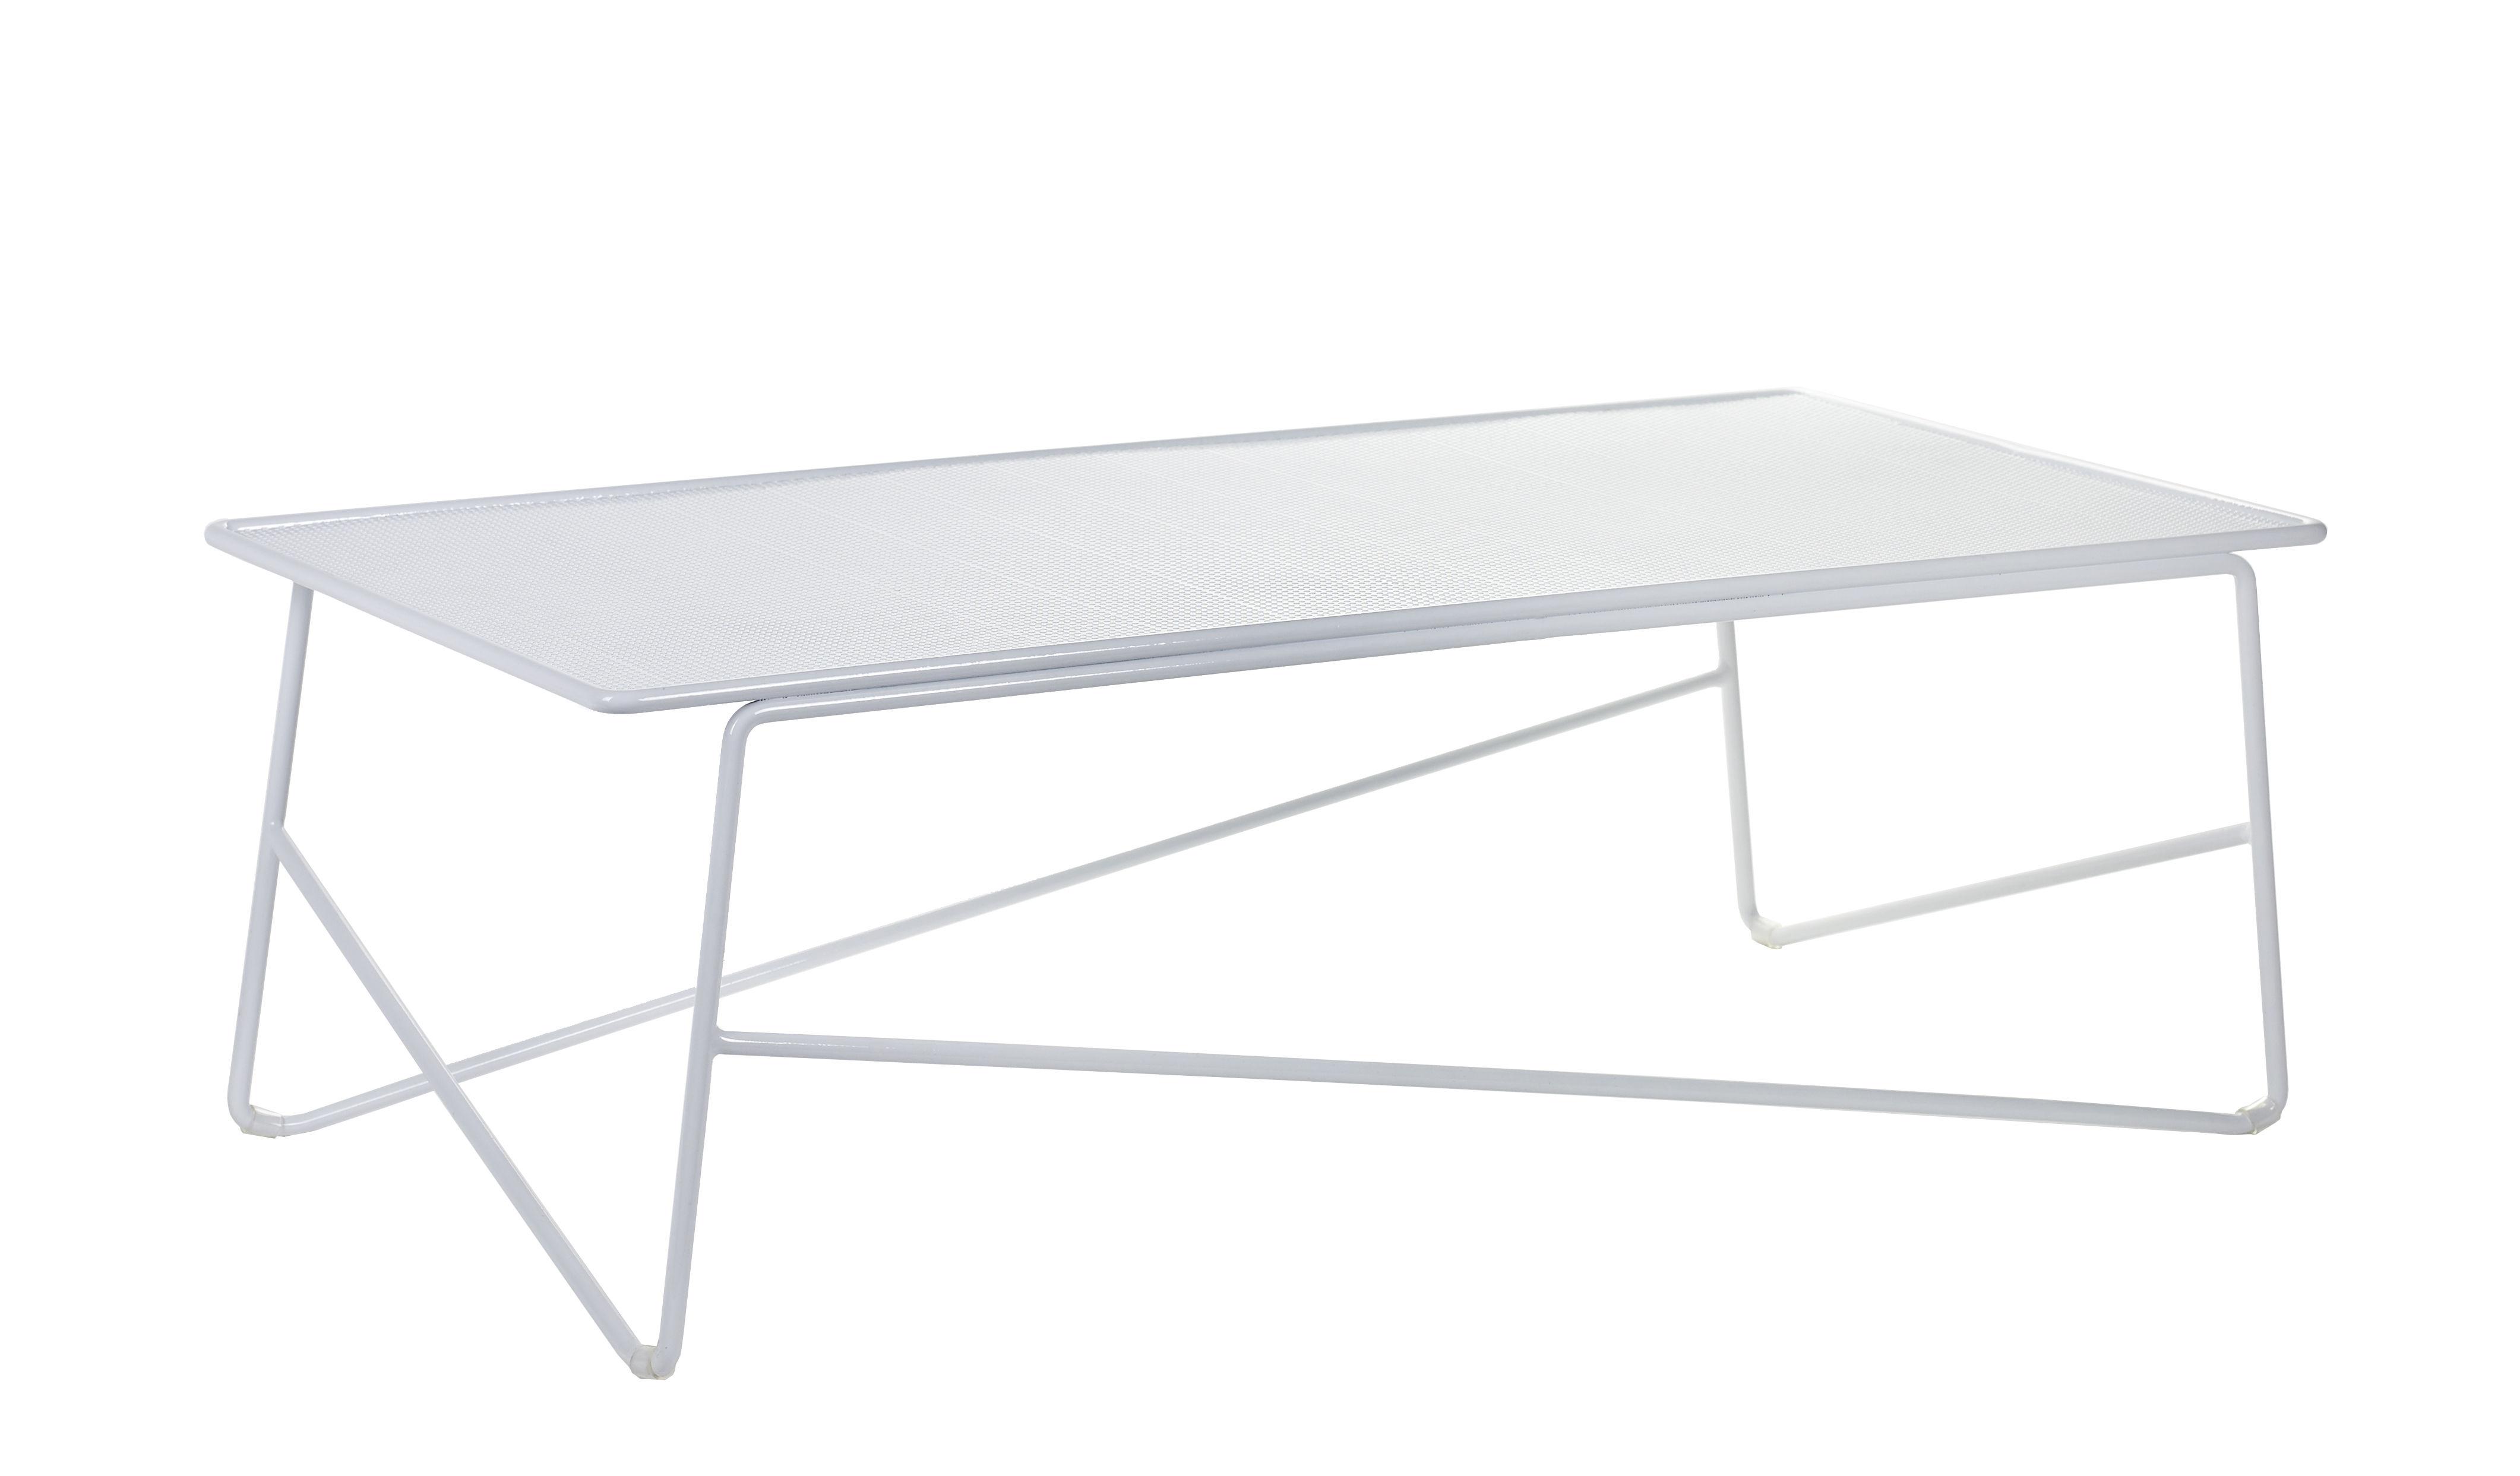 Mobilier - Tables basses - Table basse Fish & Fish / Large - 90 x 45 cm - Serax - Blanc - Aluminium laqué